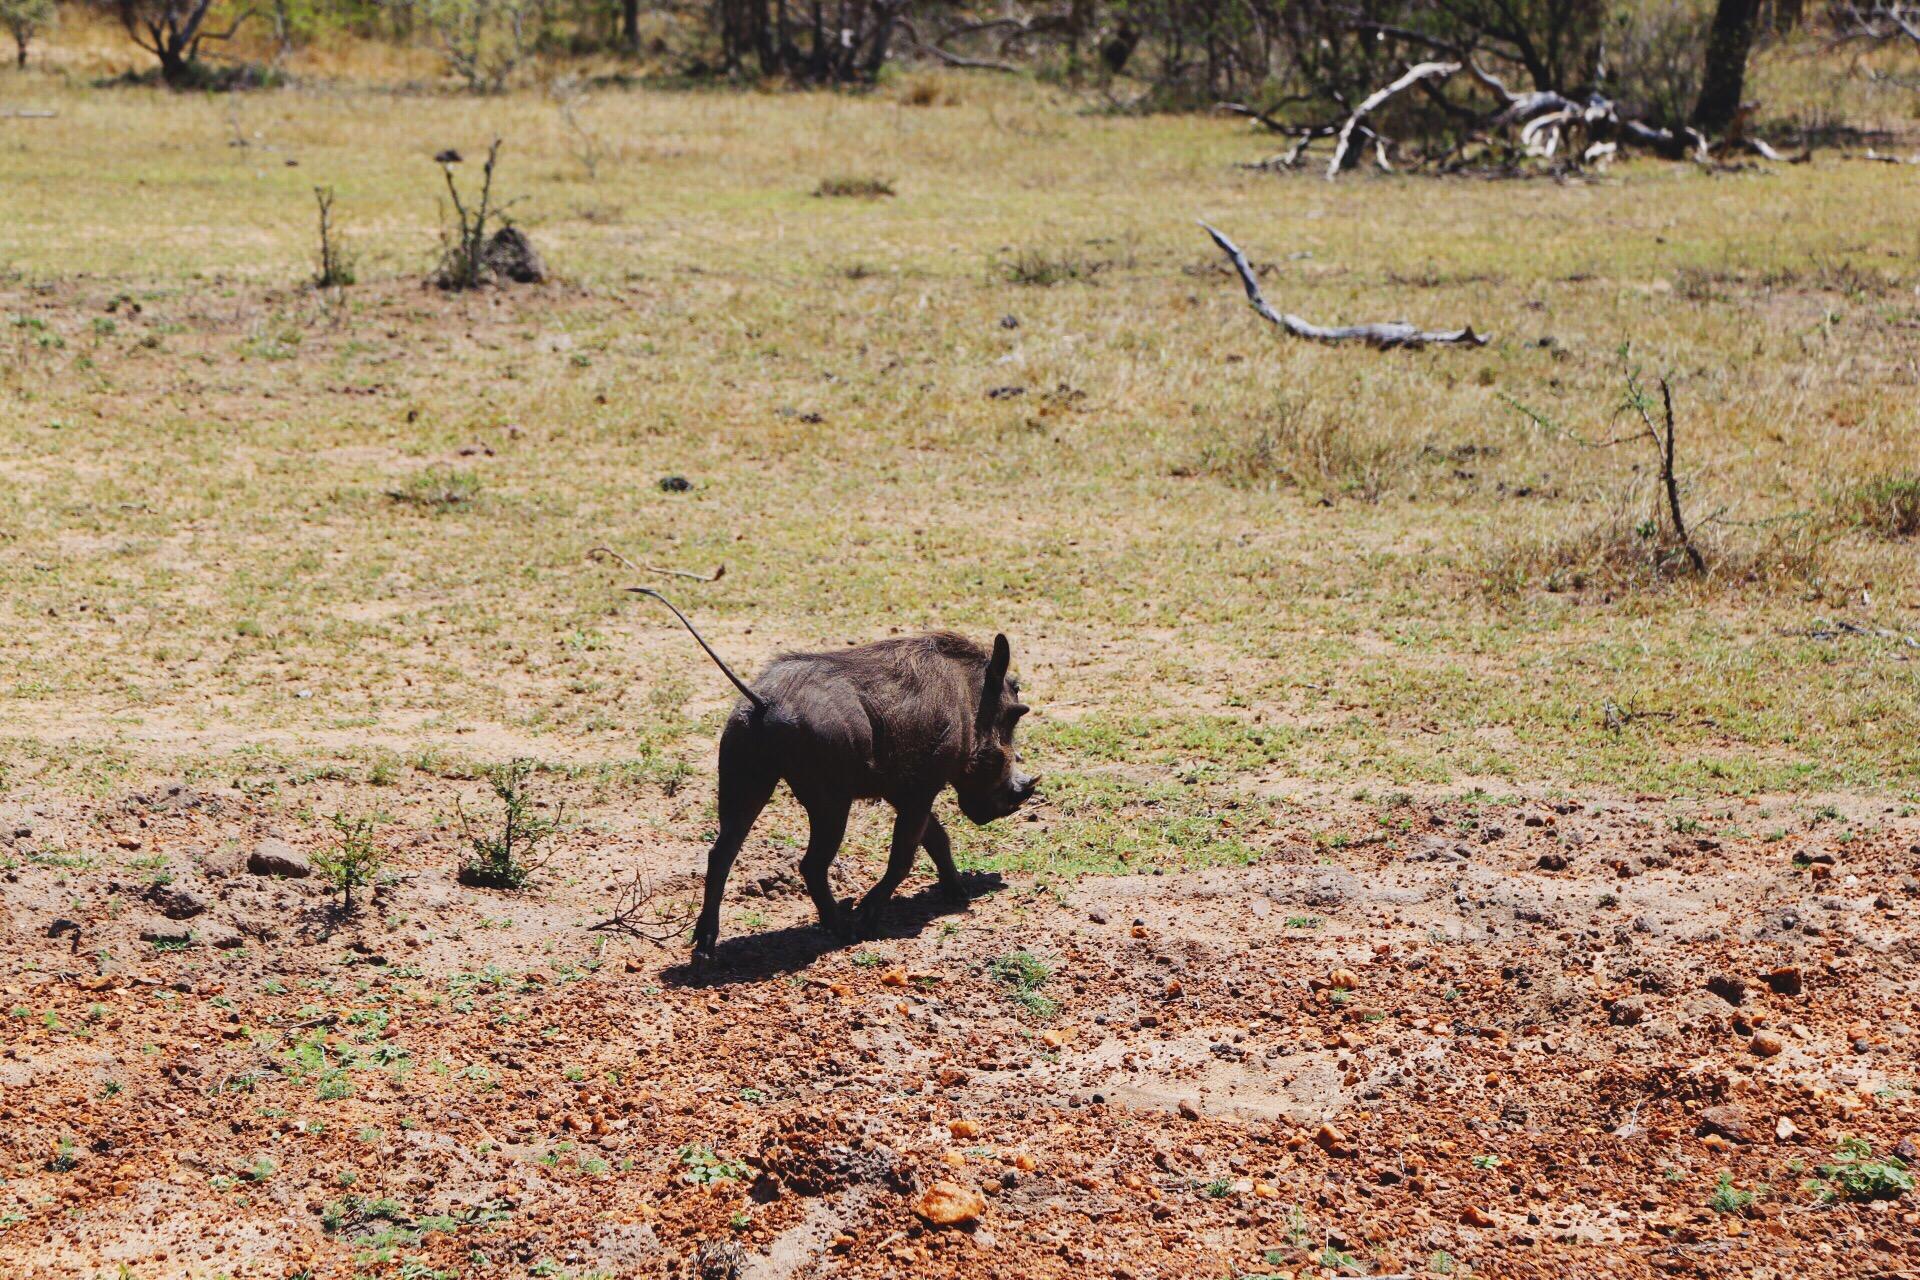 Safari In South Africa - A Photo Diary (11)